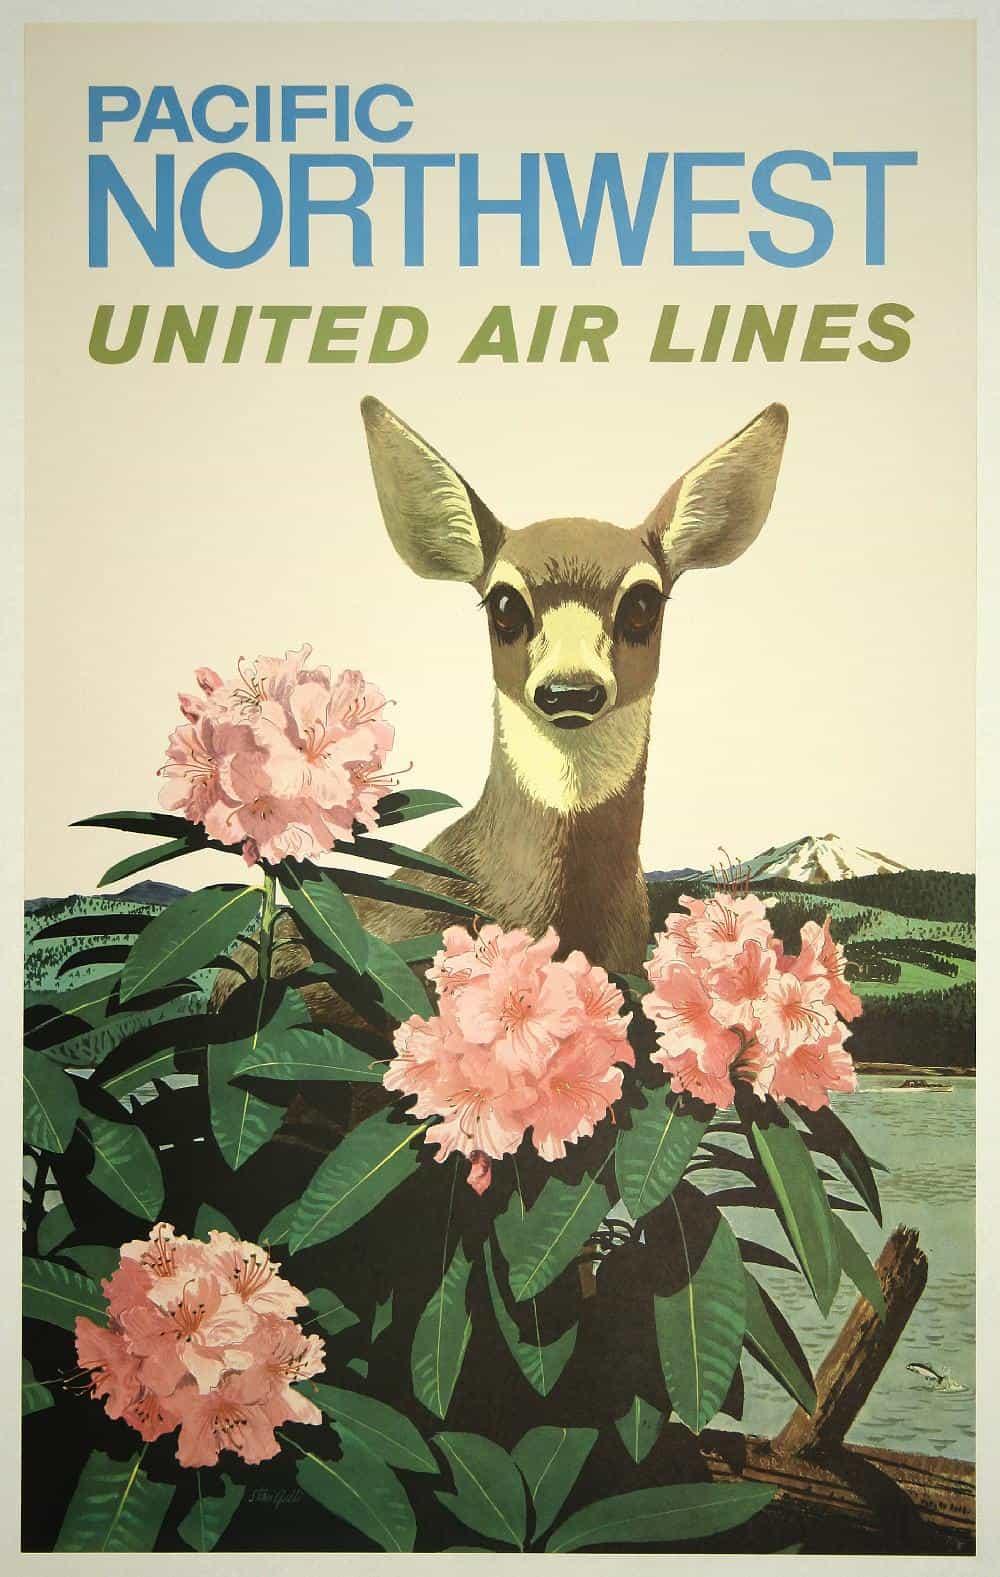 Pacific Northwest Vintage Travel Poster - Los angeles posters vintage